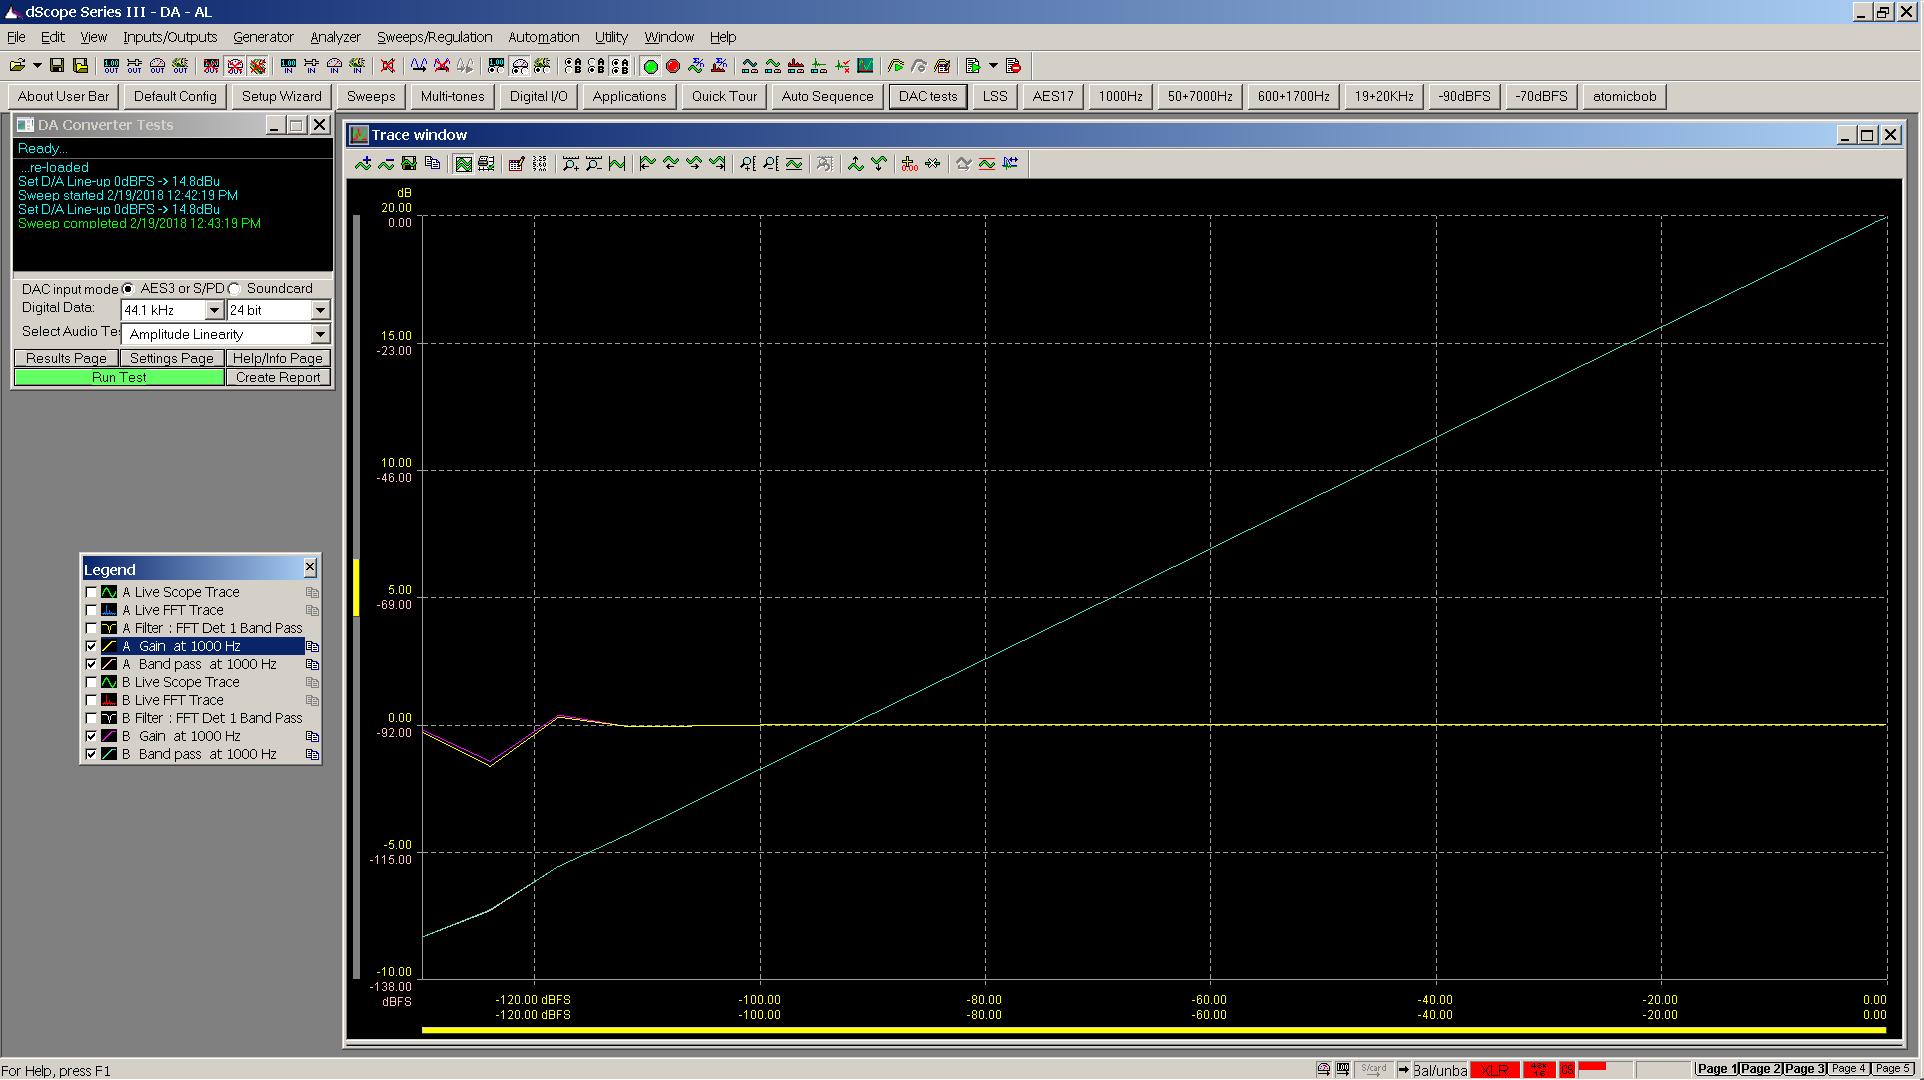 20180219-11 Yggdrasil Bal 1 KHz gain linearity + bandpass - spdif.PNG